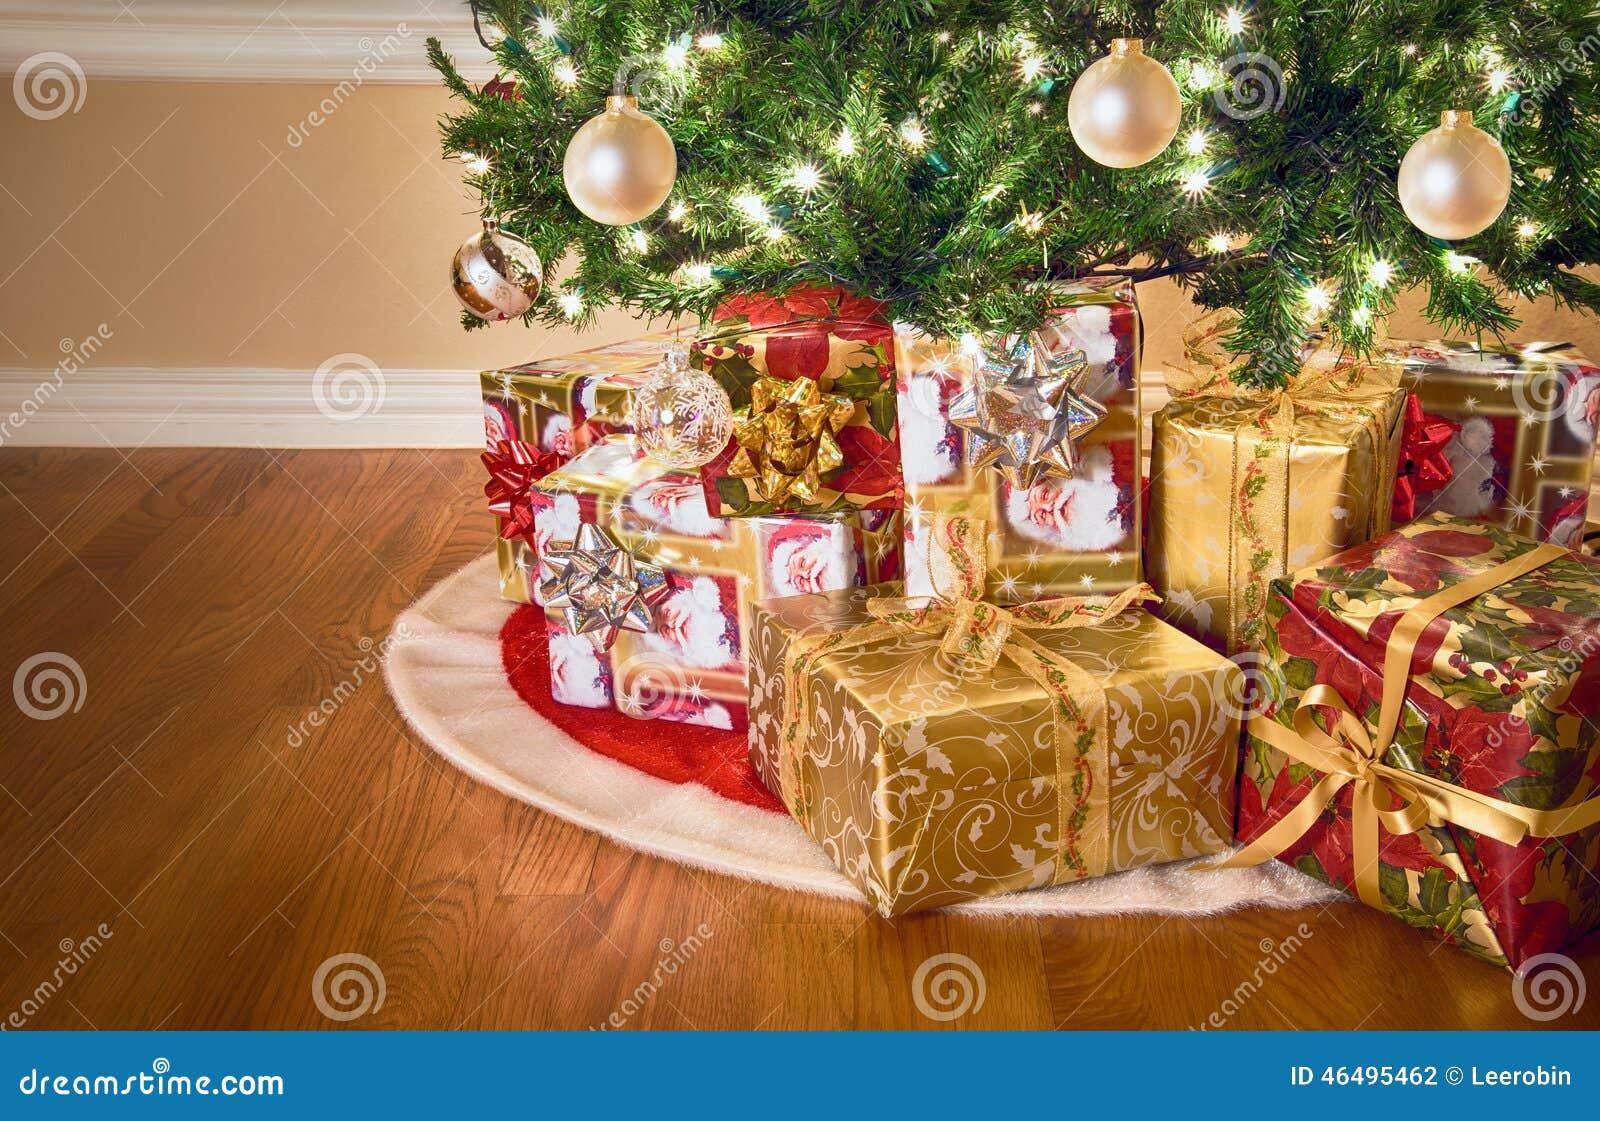 Gifts Under Christmas Tree Stock Photo Image 46495462